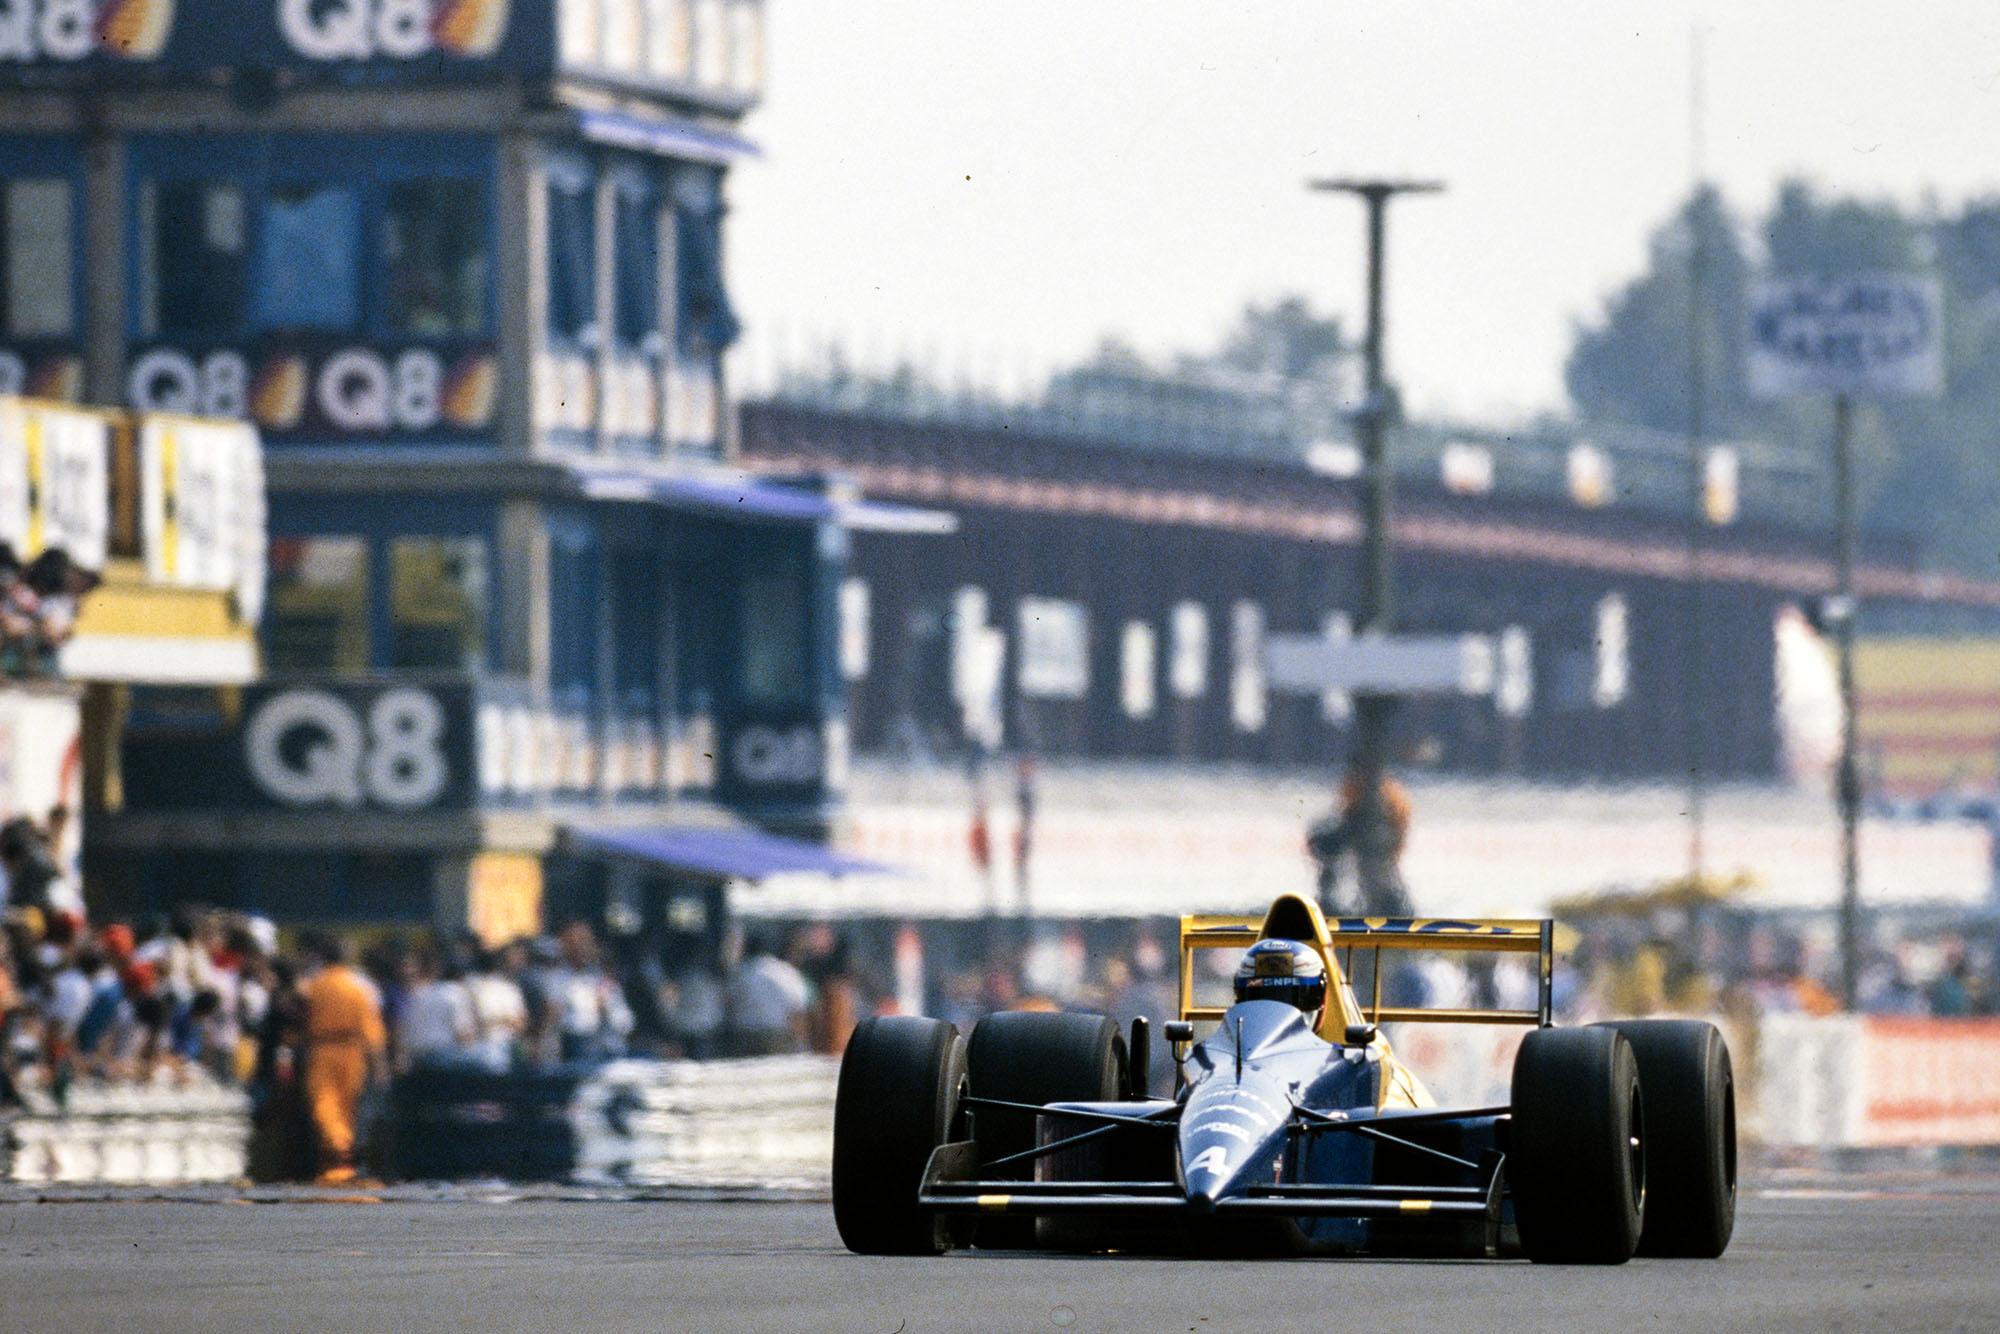 1989 ITA GP Alesi 5th